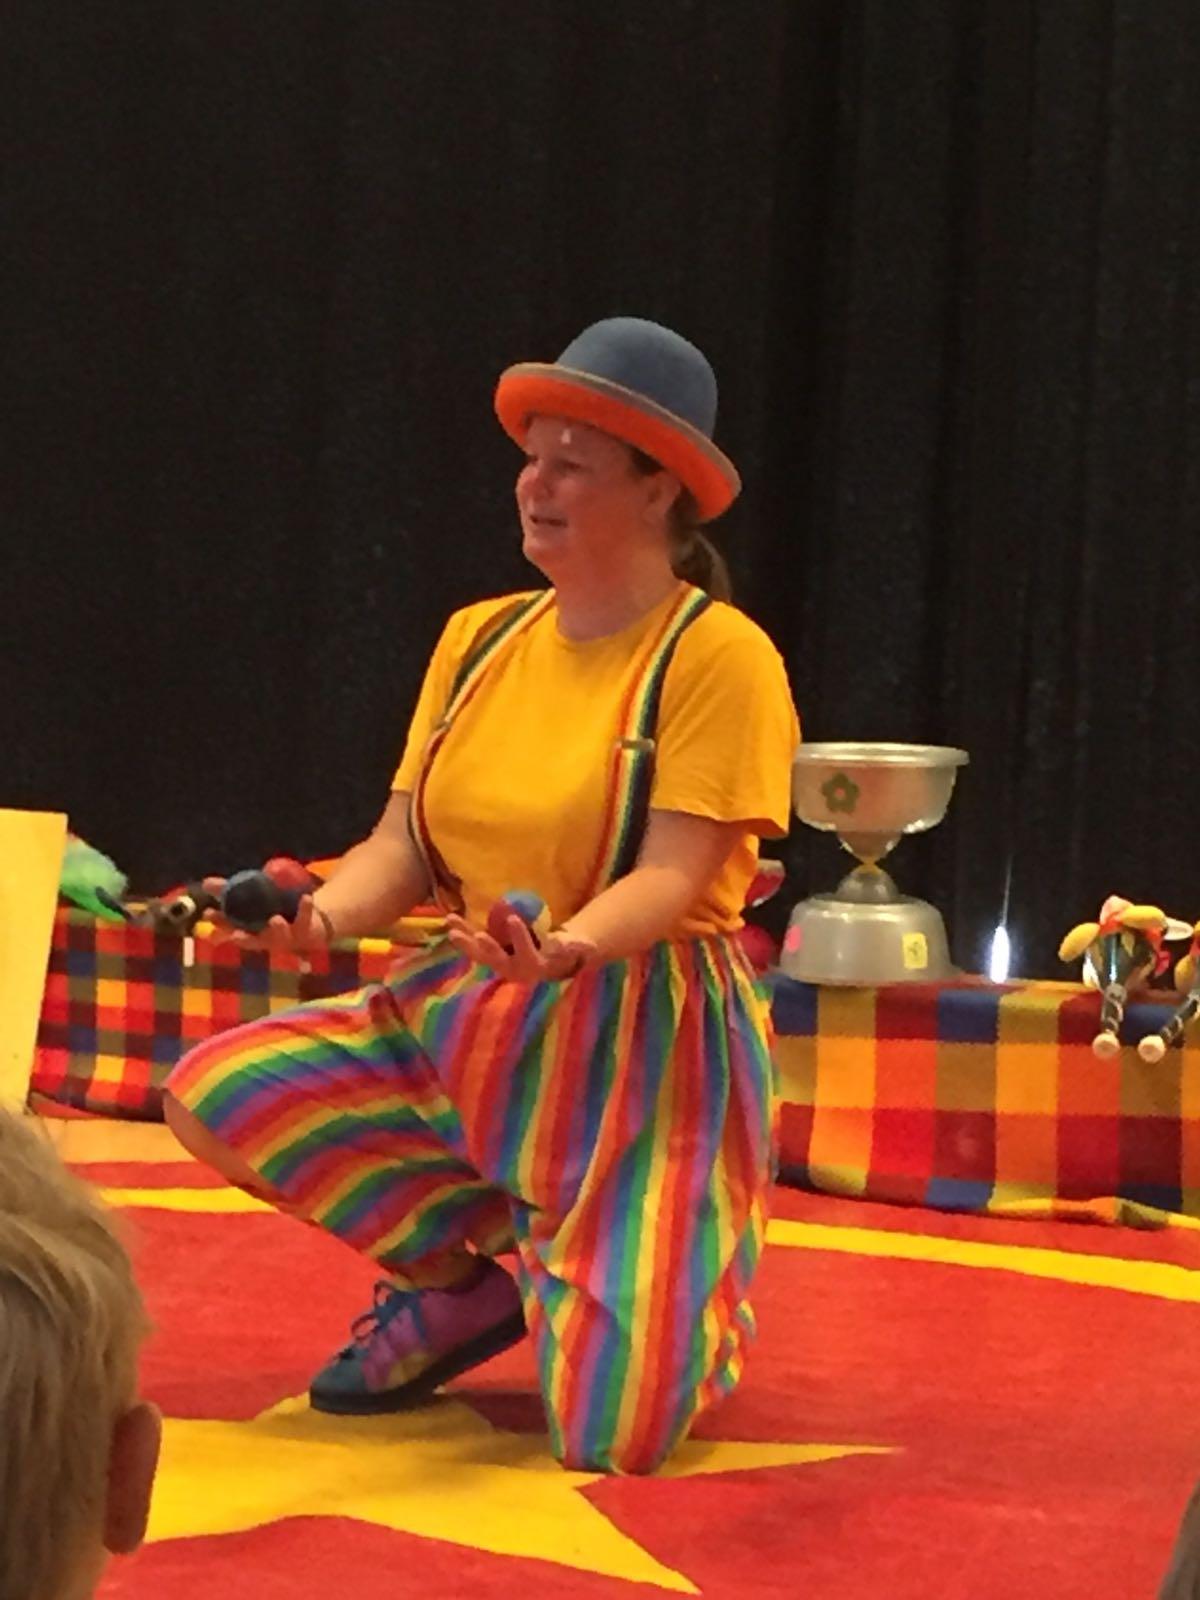 Clown Kiko BSO Kion zomertour voorstelling jongleren